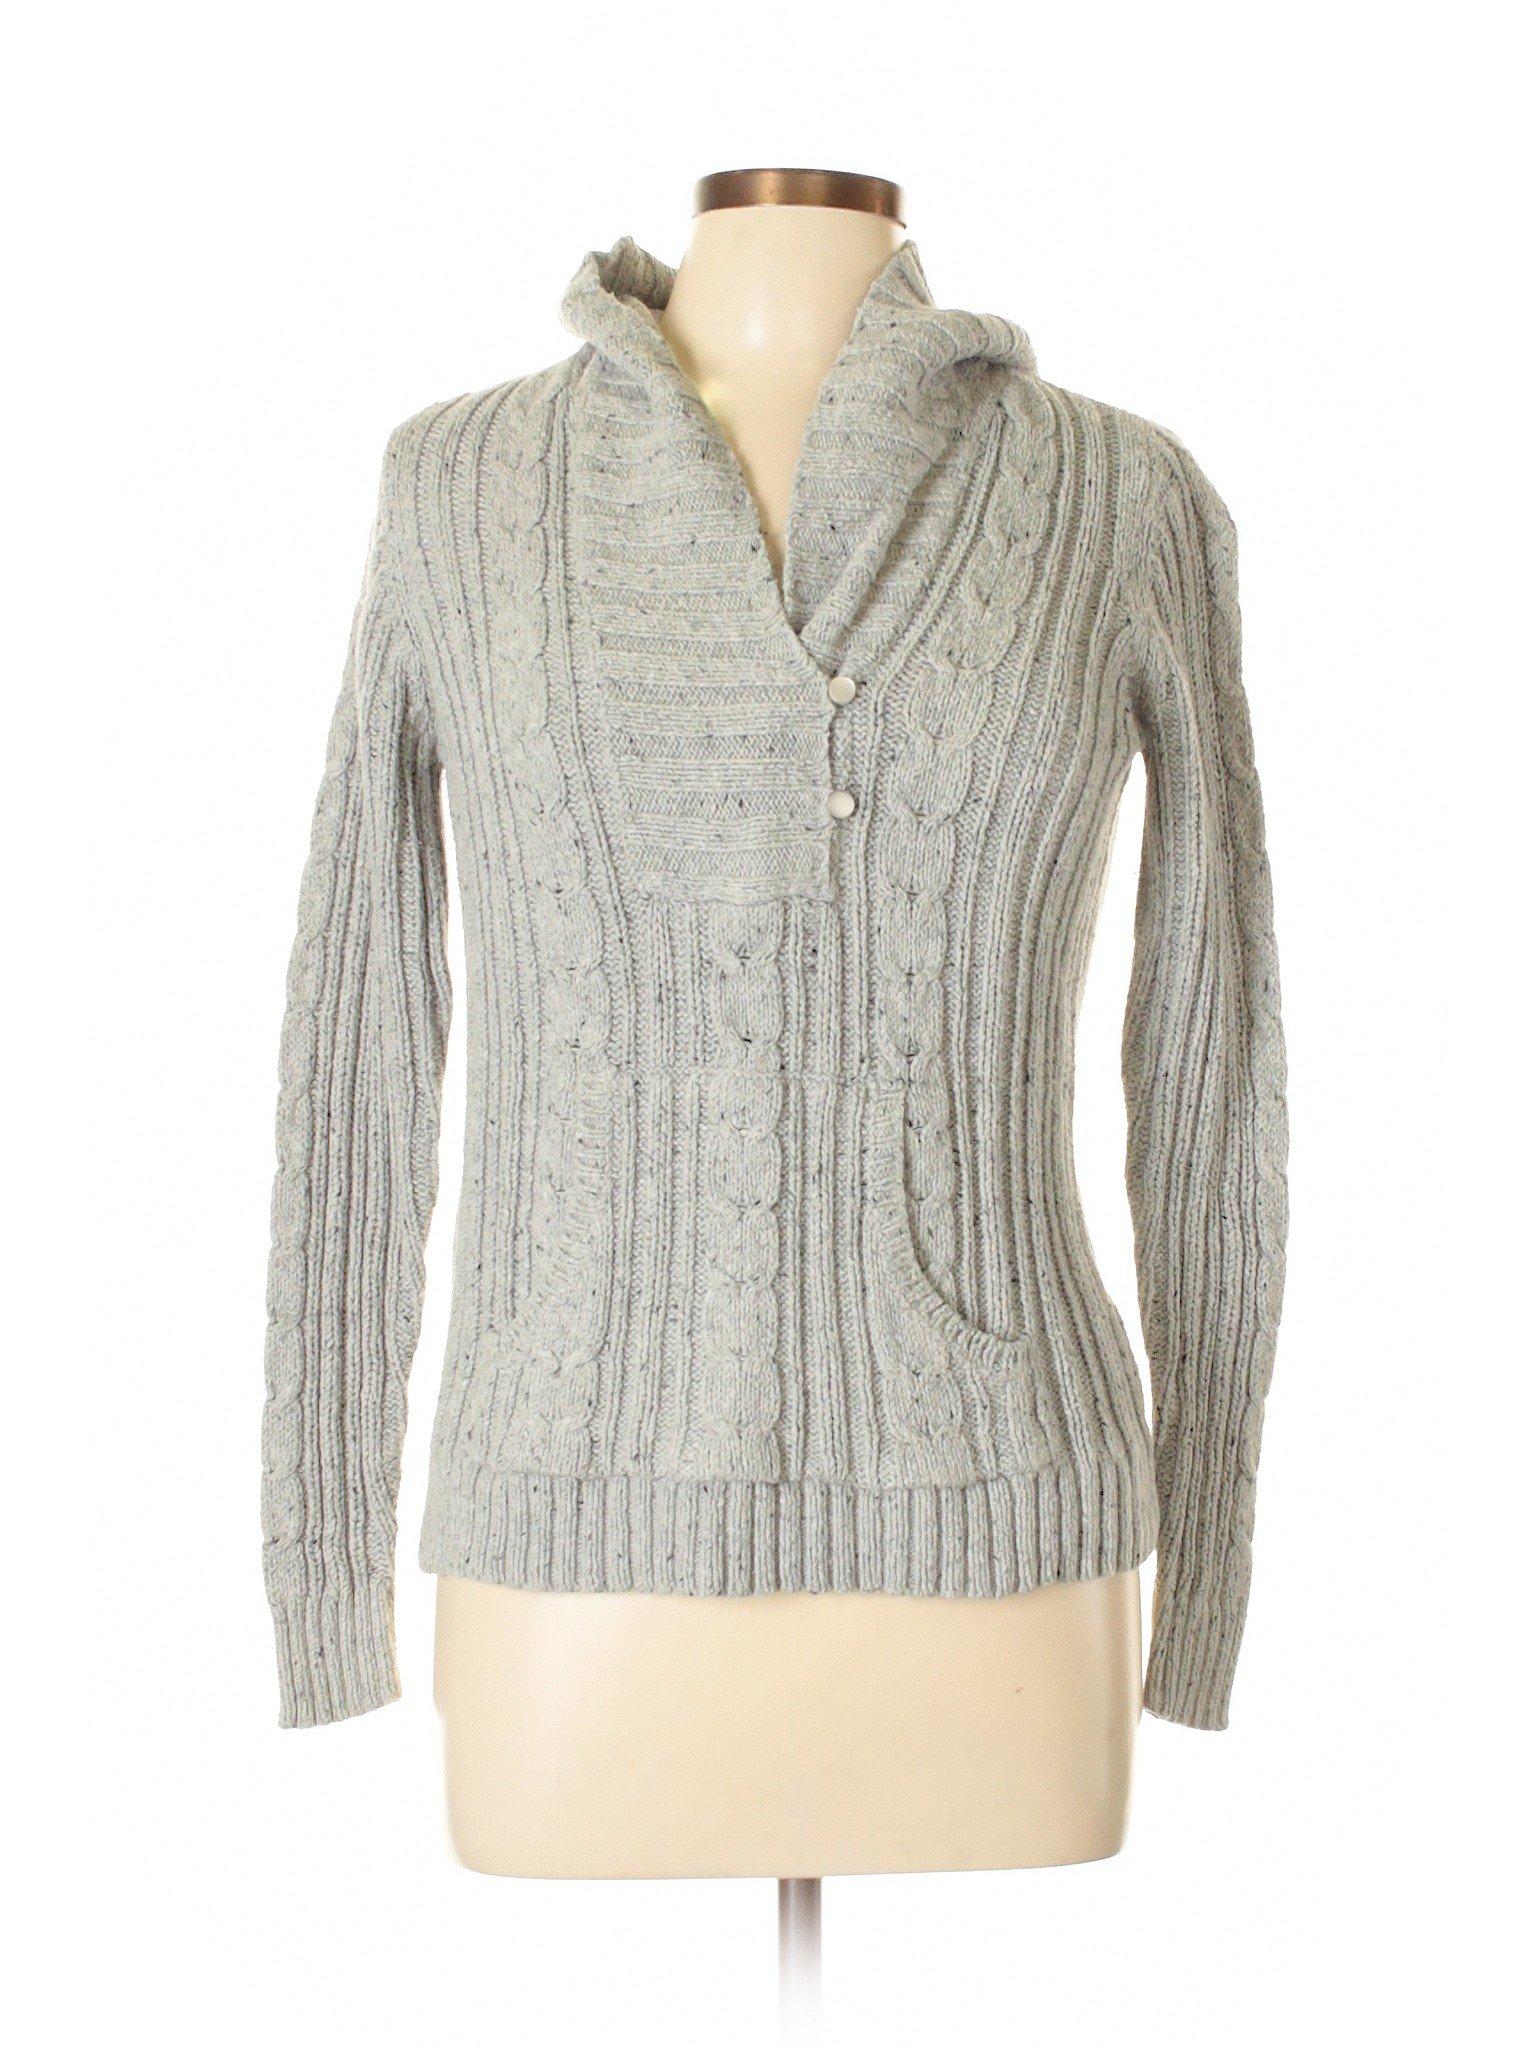 Bay Pullover Boutique Sweater John's winter St wqw6xtr